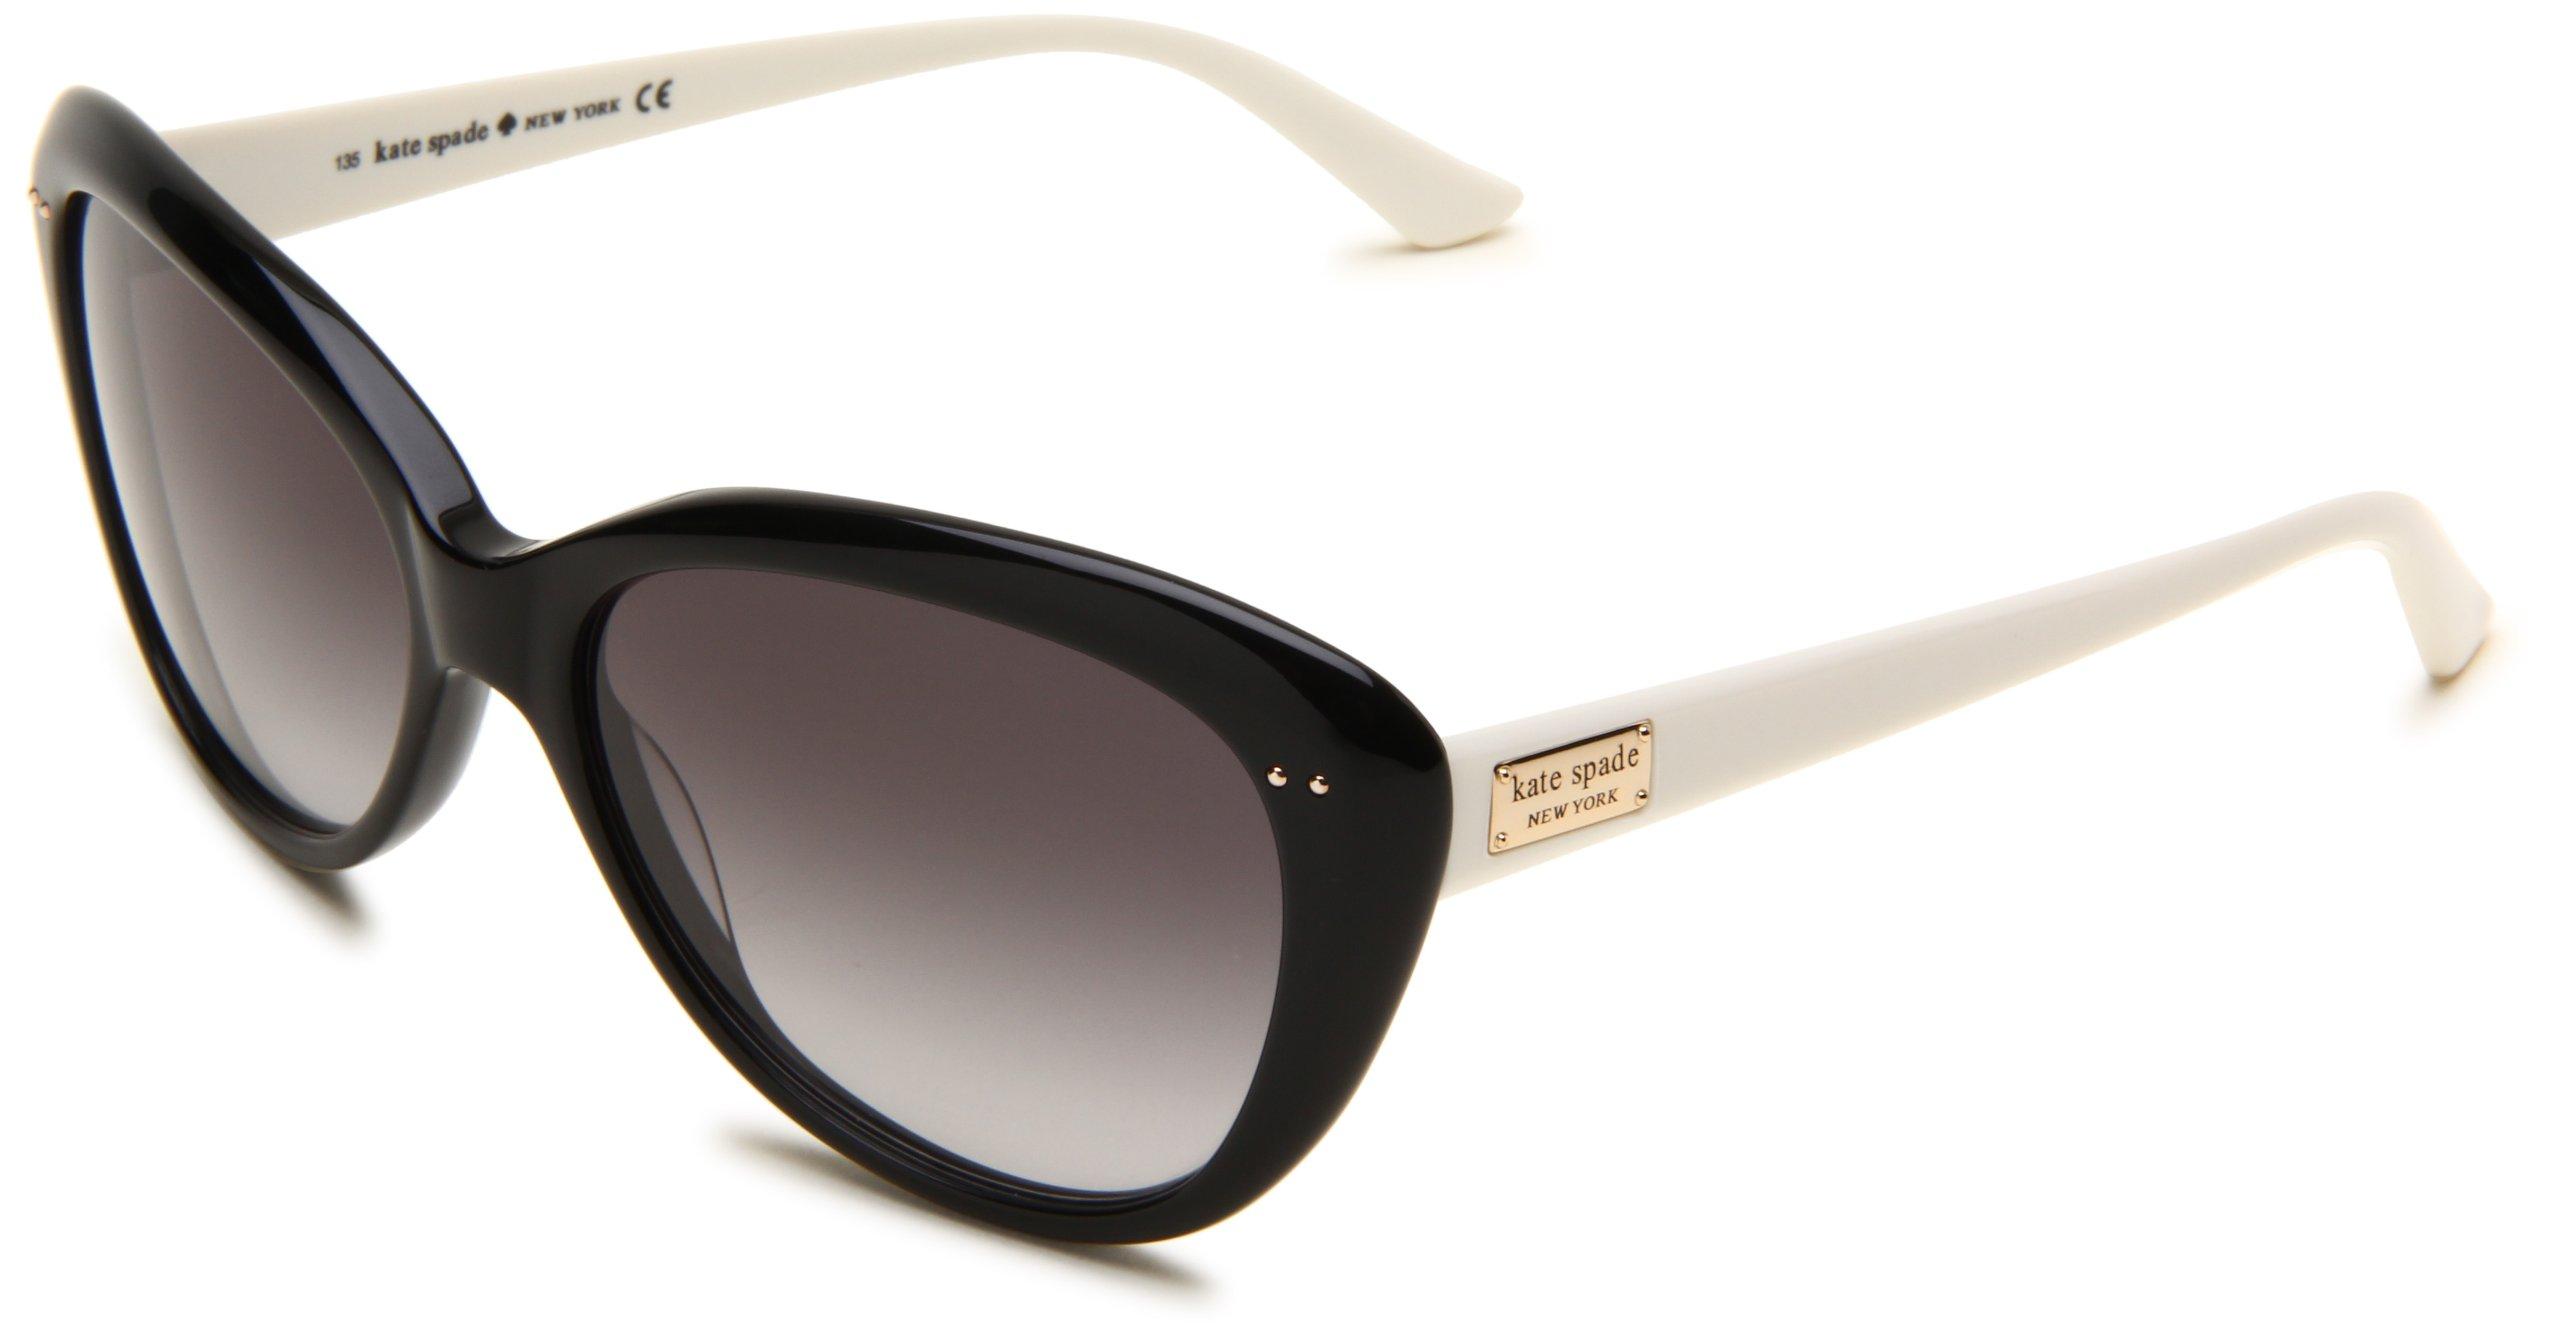 Kate Spade Women's ANGELIQS Cat Eye Sunglasses,Black & Cream Frame/Gray Gradient Lens,One Size by Kate Spade New York (Image #1)